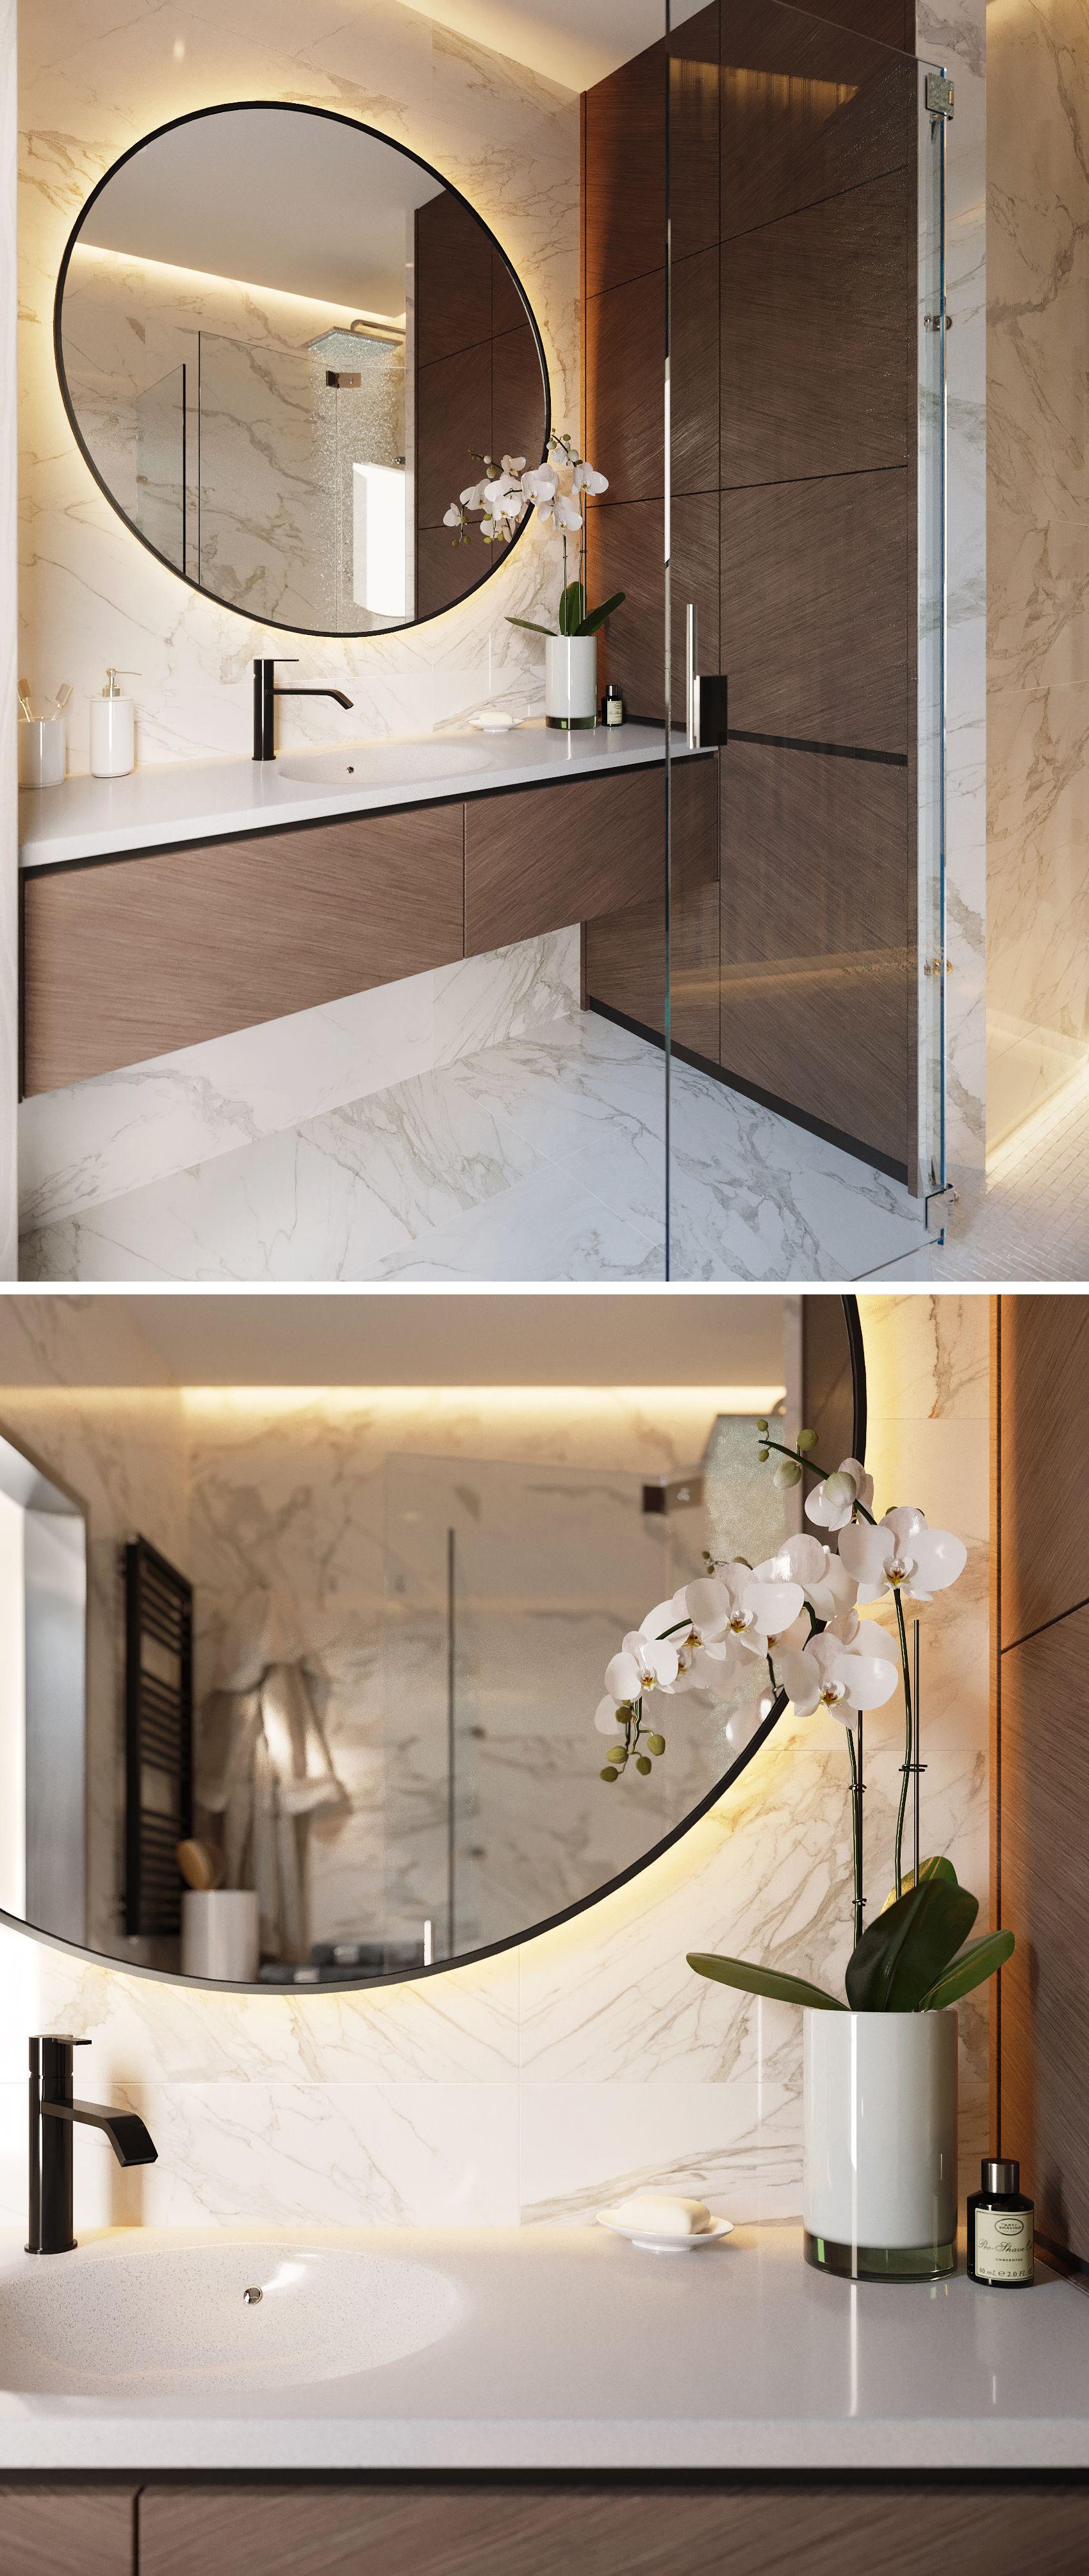 Salle De Bain Shower Curtain ~ Rose Quartz 3ddd Ru Home Pinterest Deco Salle De